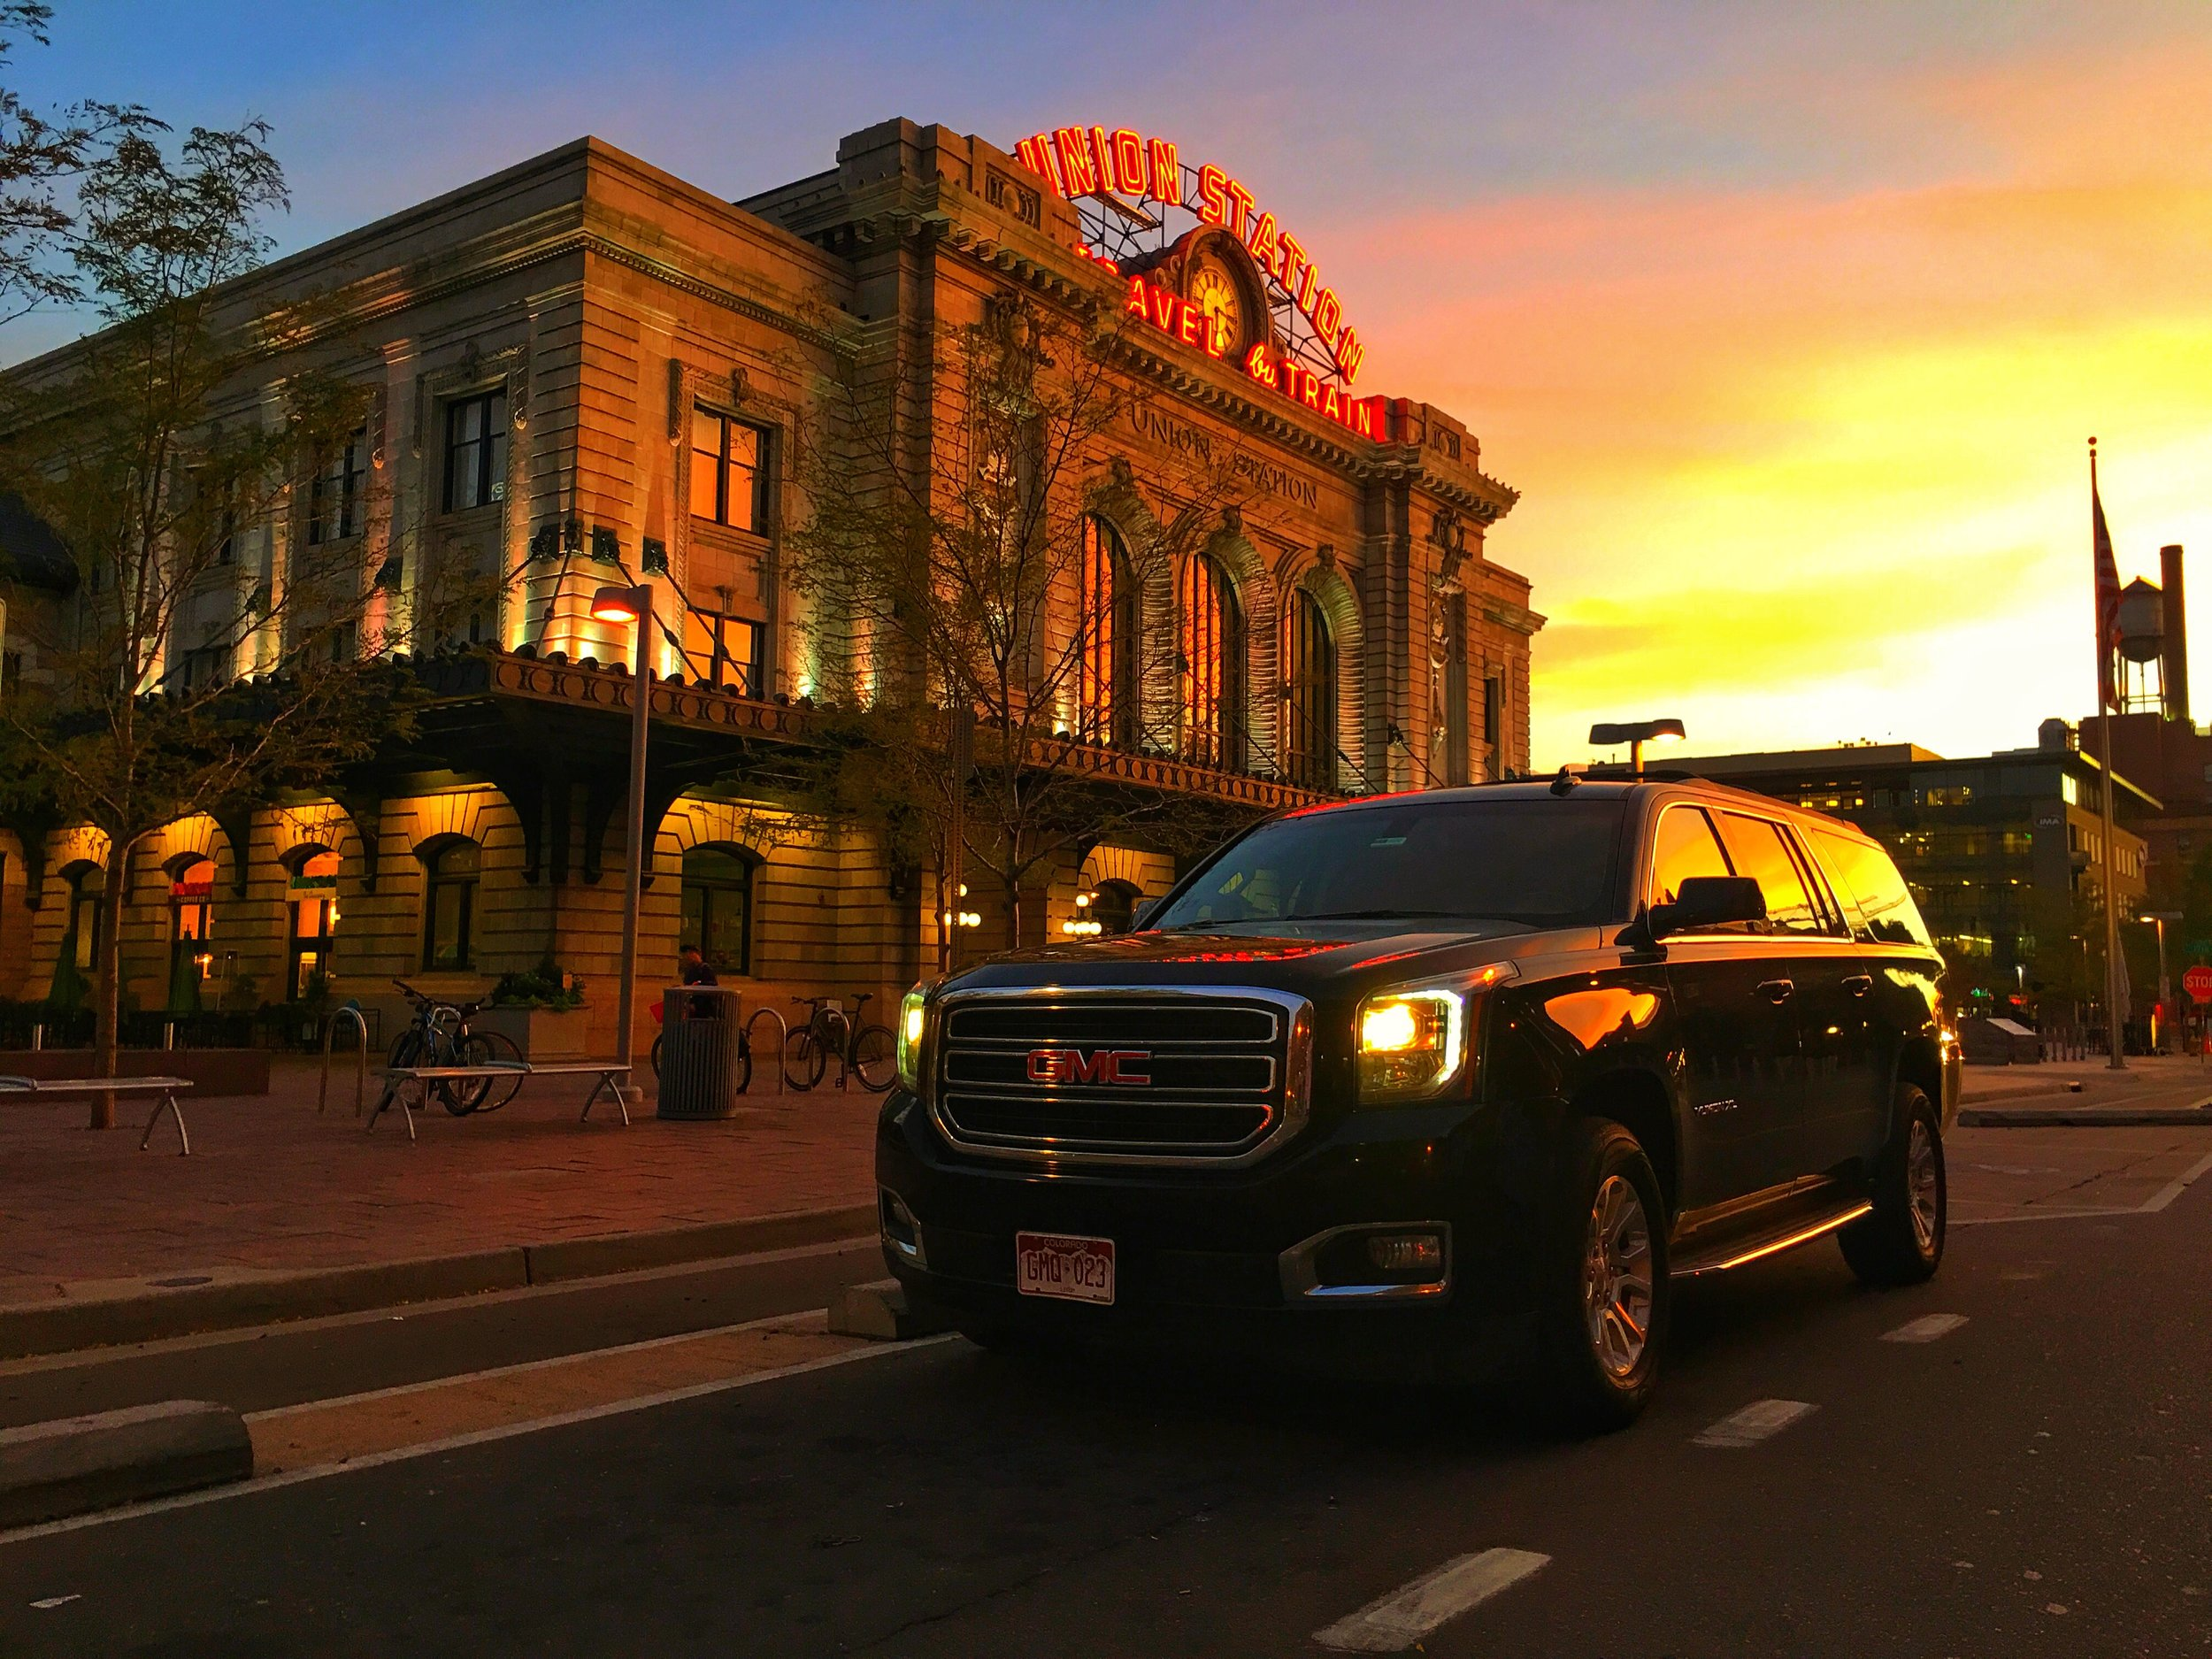 Copy of Downtown Denver